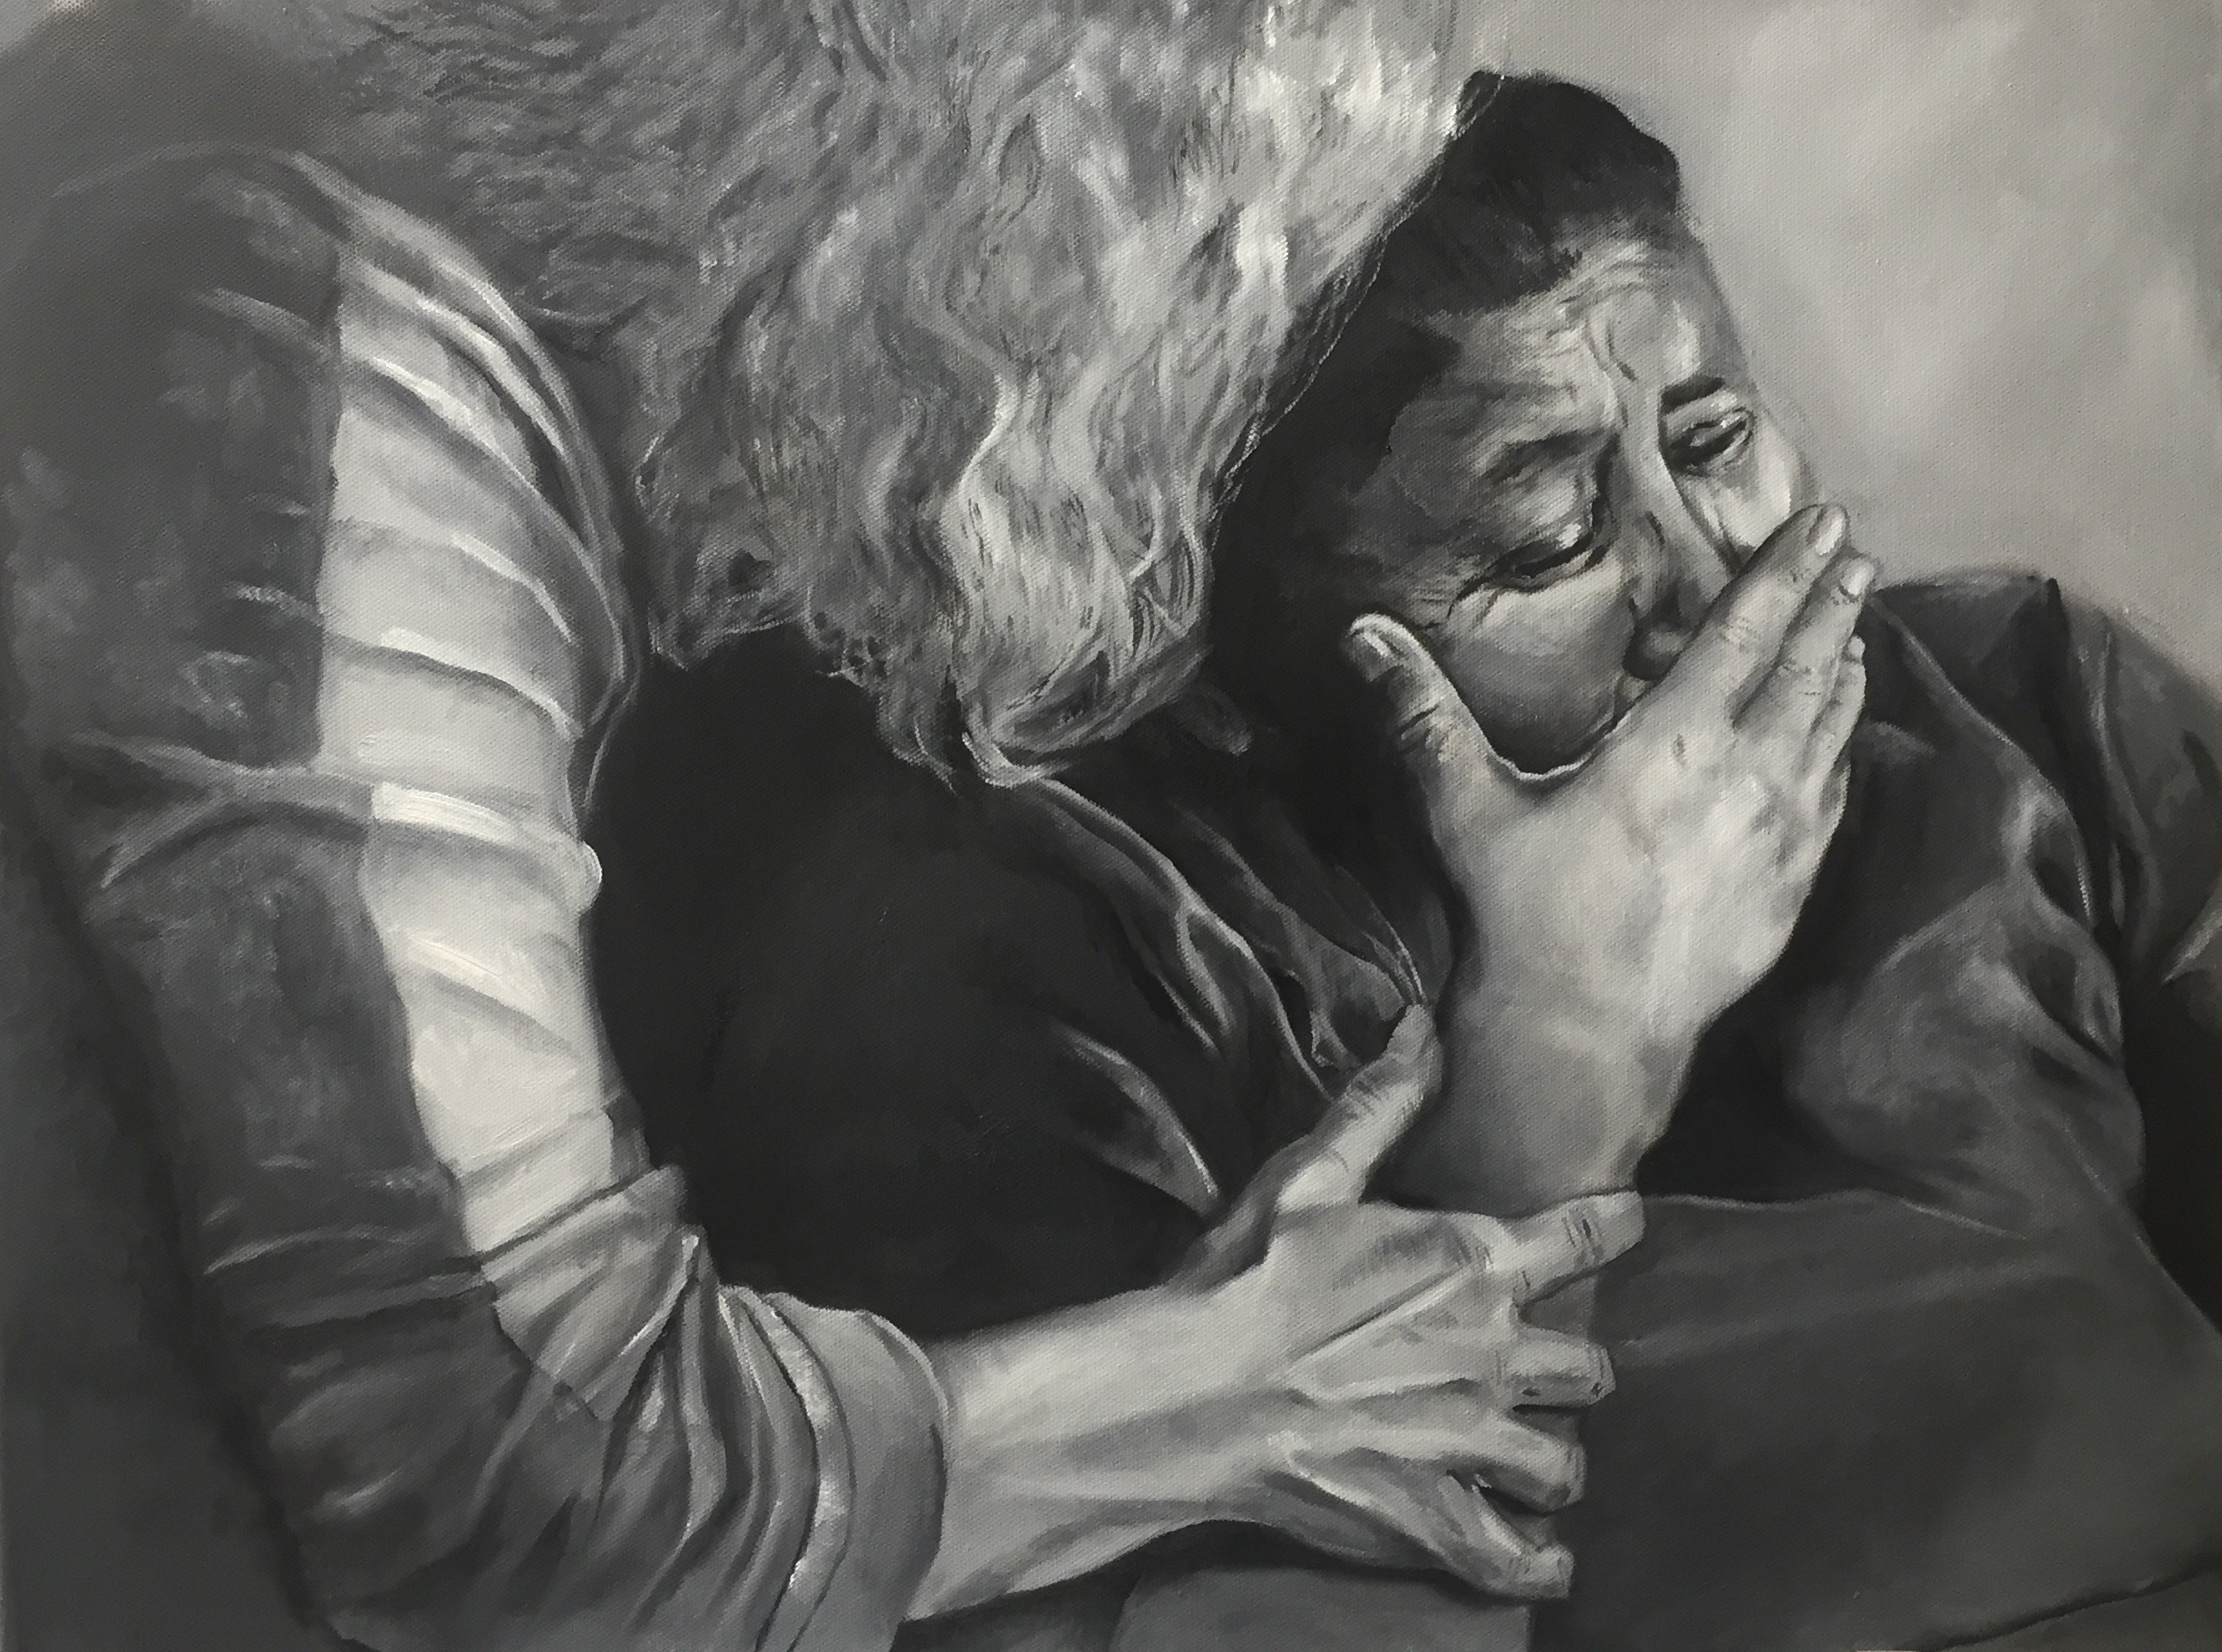 Original painting by Emma Catherine McAllister, 2017.